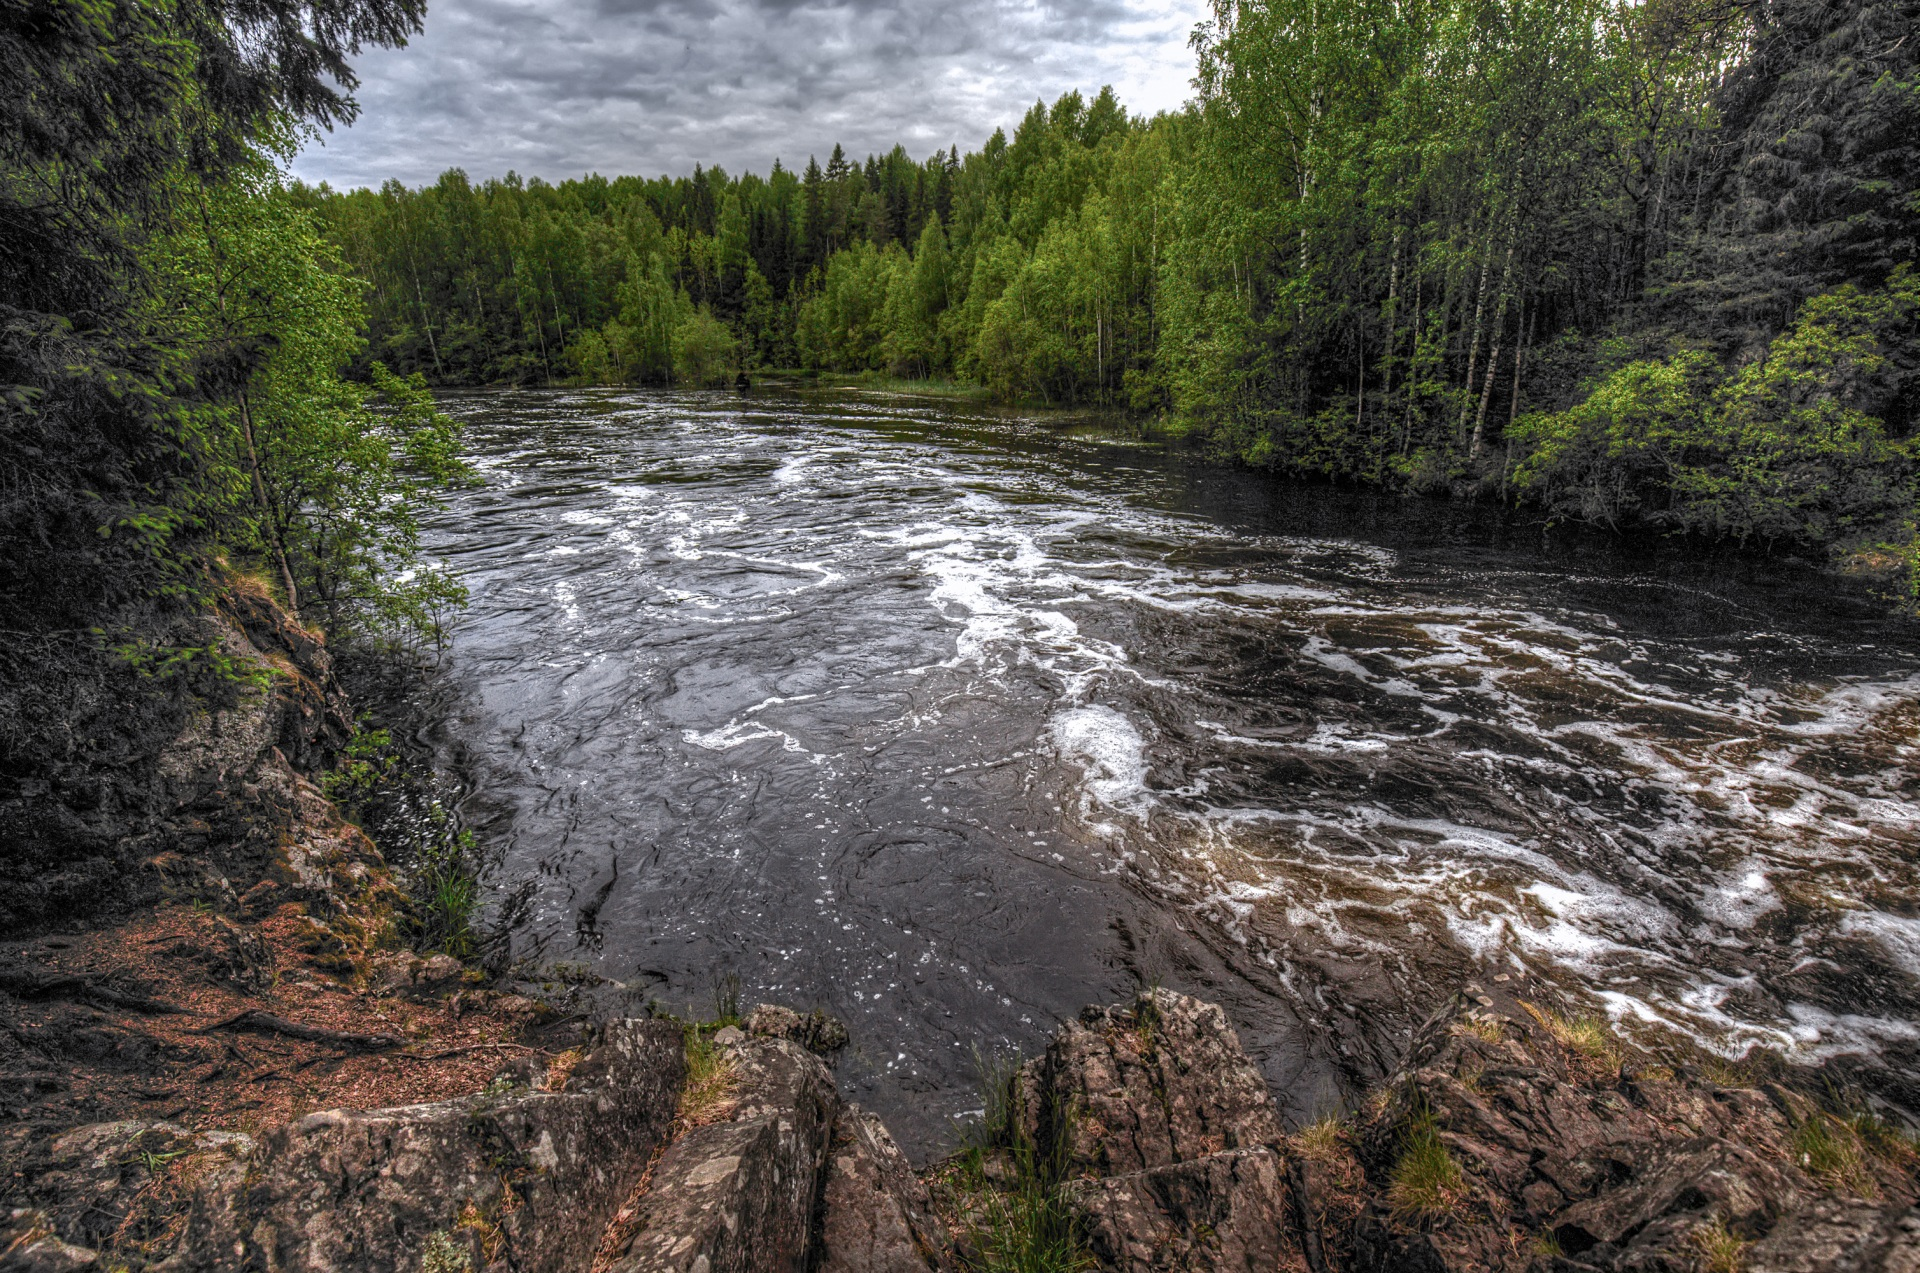 Картинки Россия Suna River Republic of Karelia Природа лес Реки 1920x1273 Леса река речка